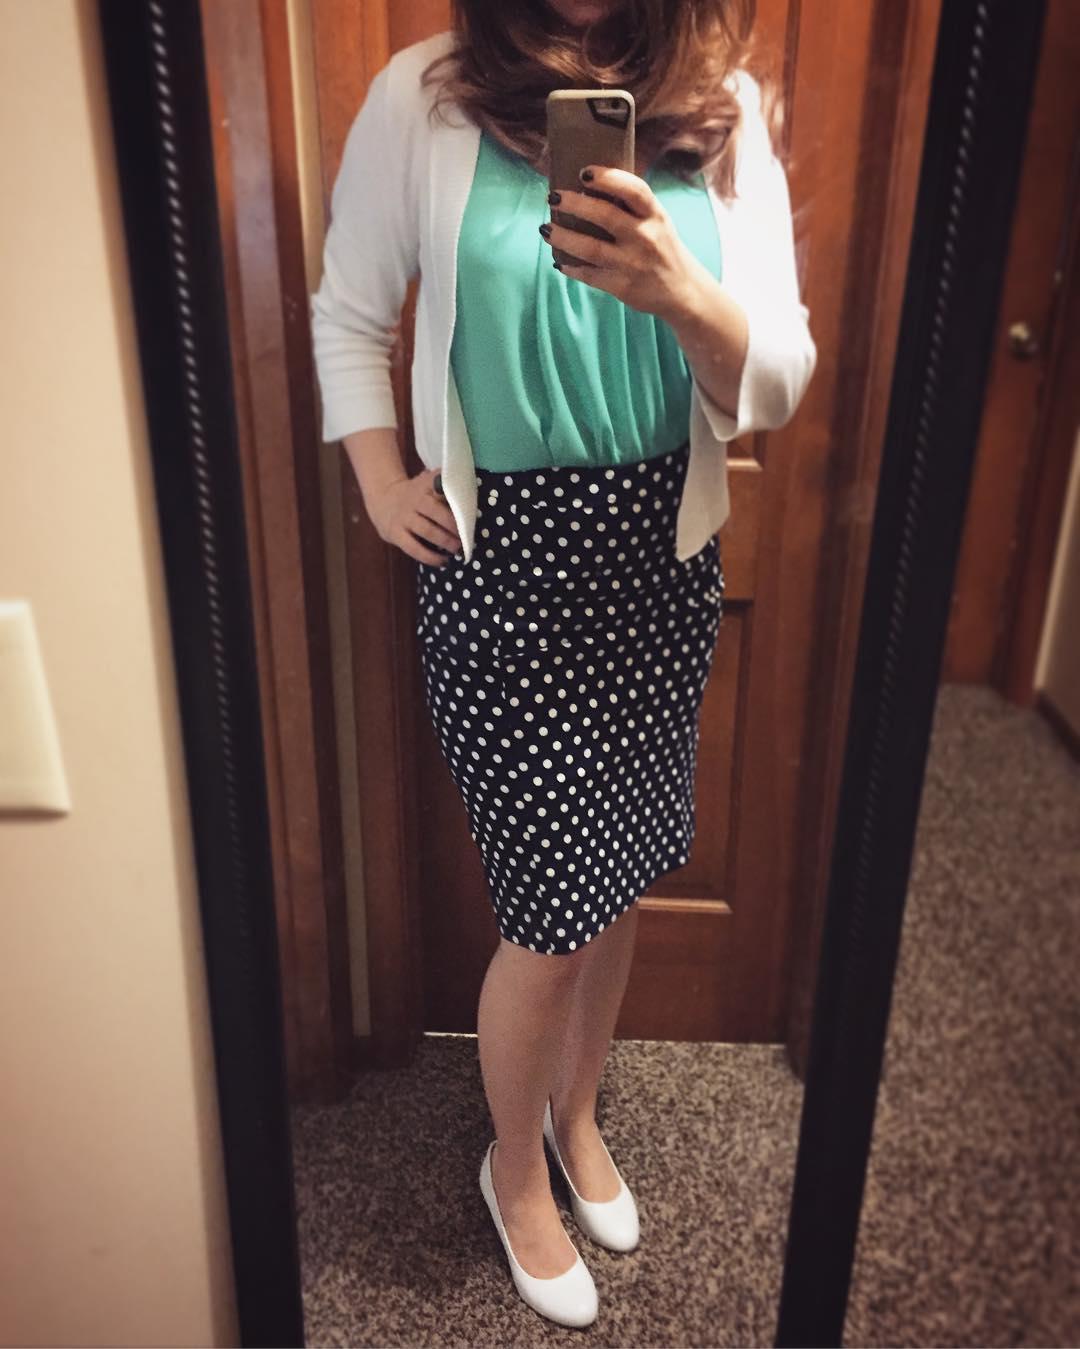 Pixley June Polka Dot Skirt + Mint Green